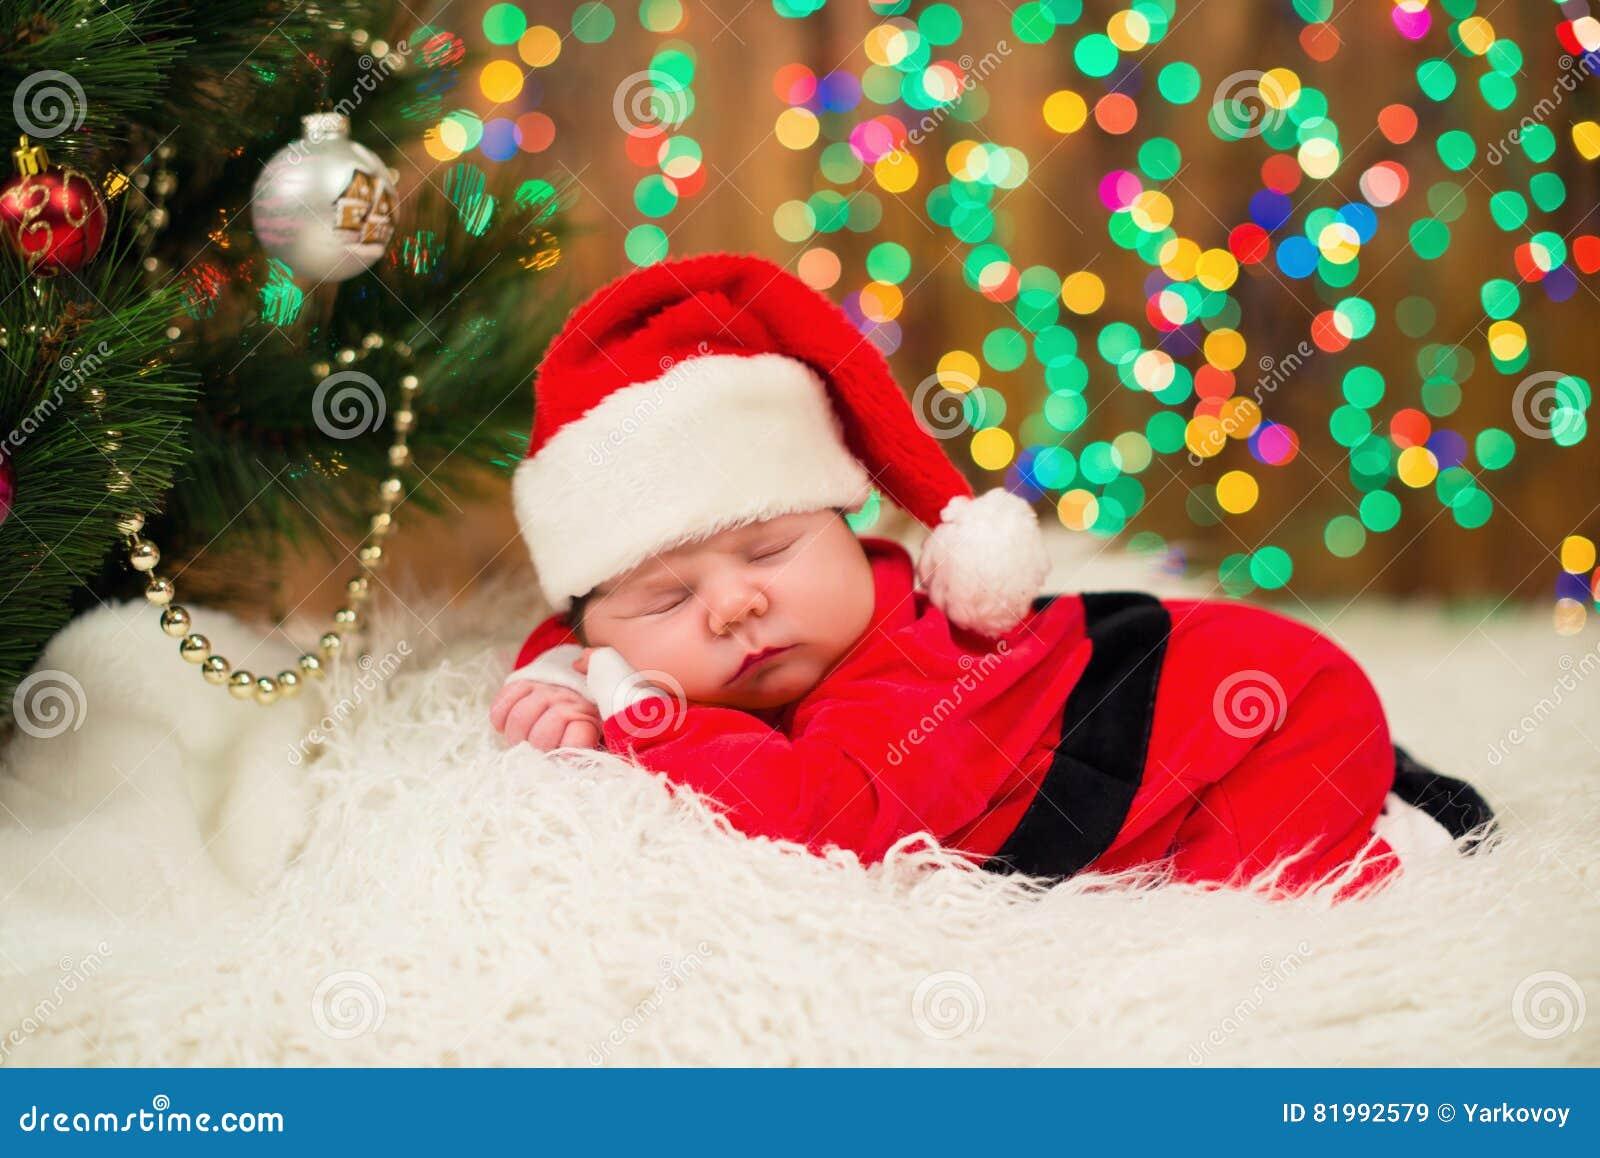 5d7426d79b96 Portrait Of Newborn Baby In Santa Clothes Lying Under Christmas Tree ...